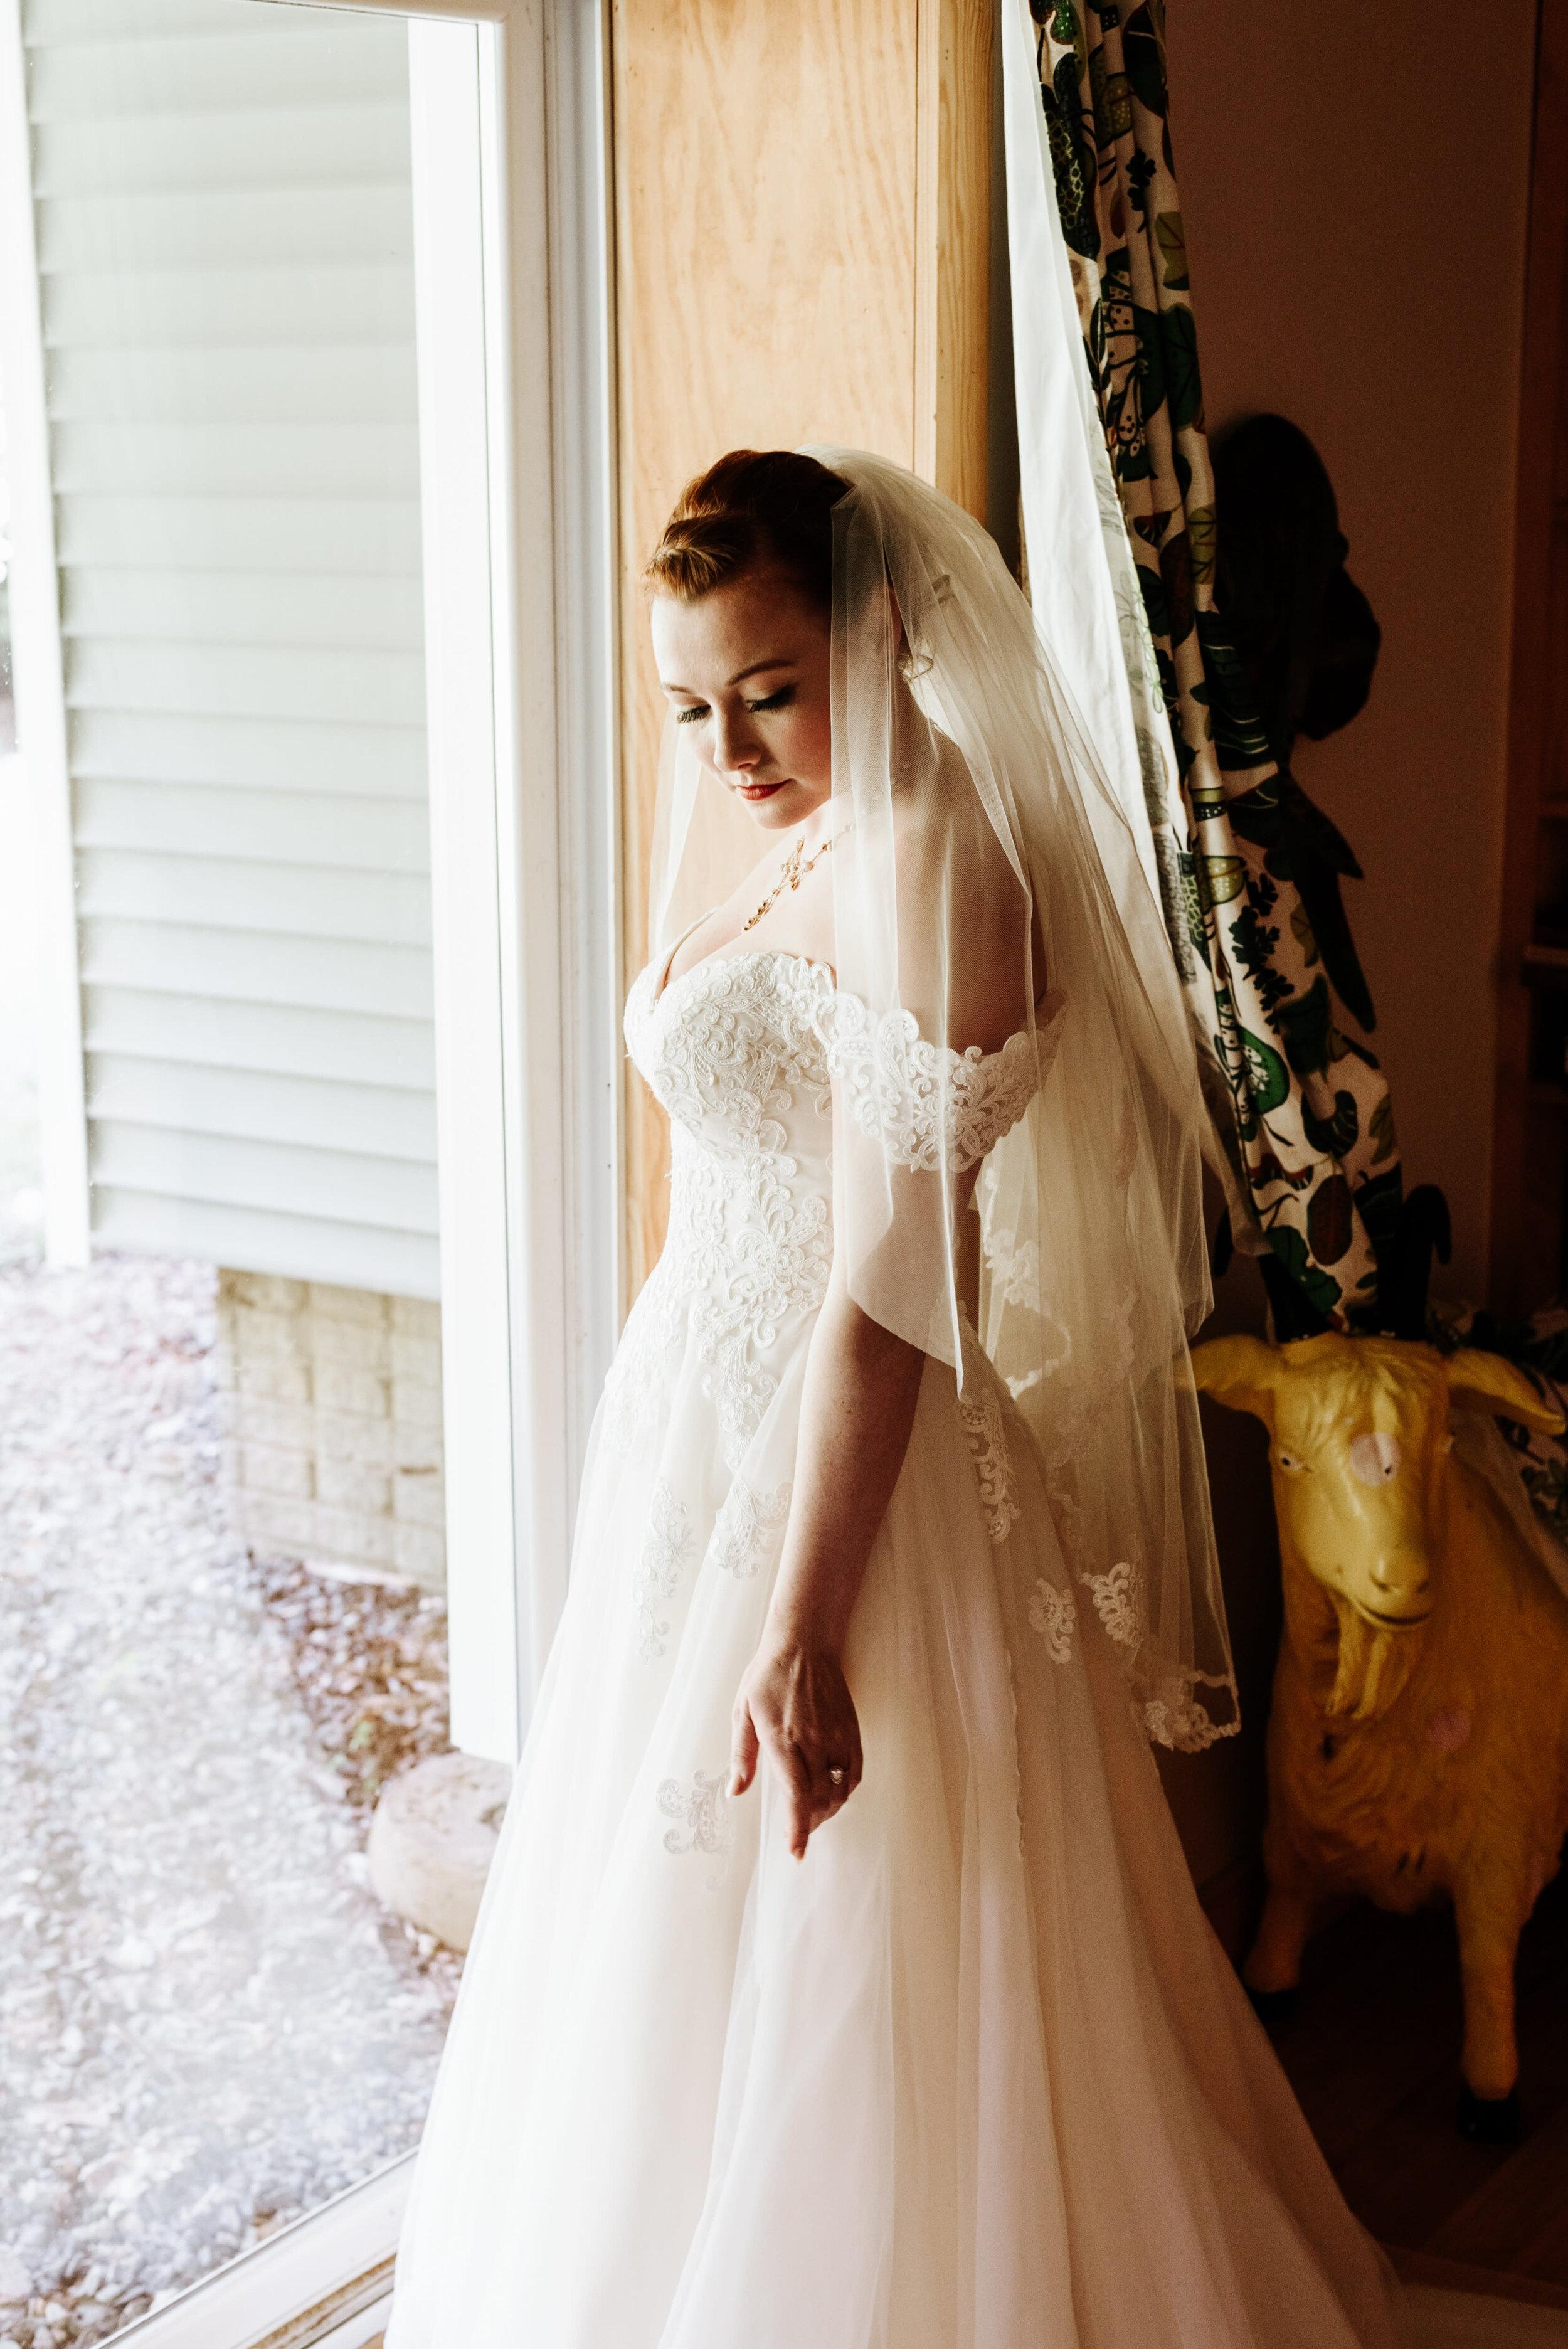 Rachel_David_Wedding_Richmond_Virginia_Photography_by_V_10.jpg